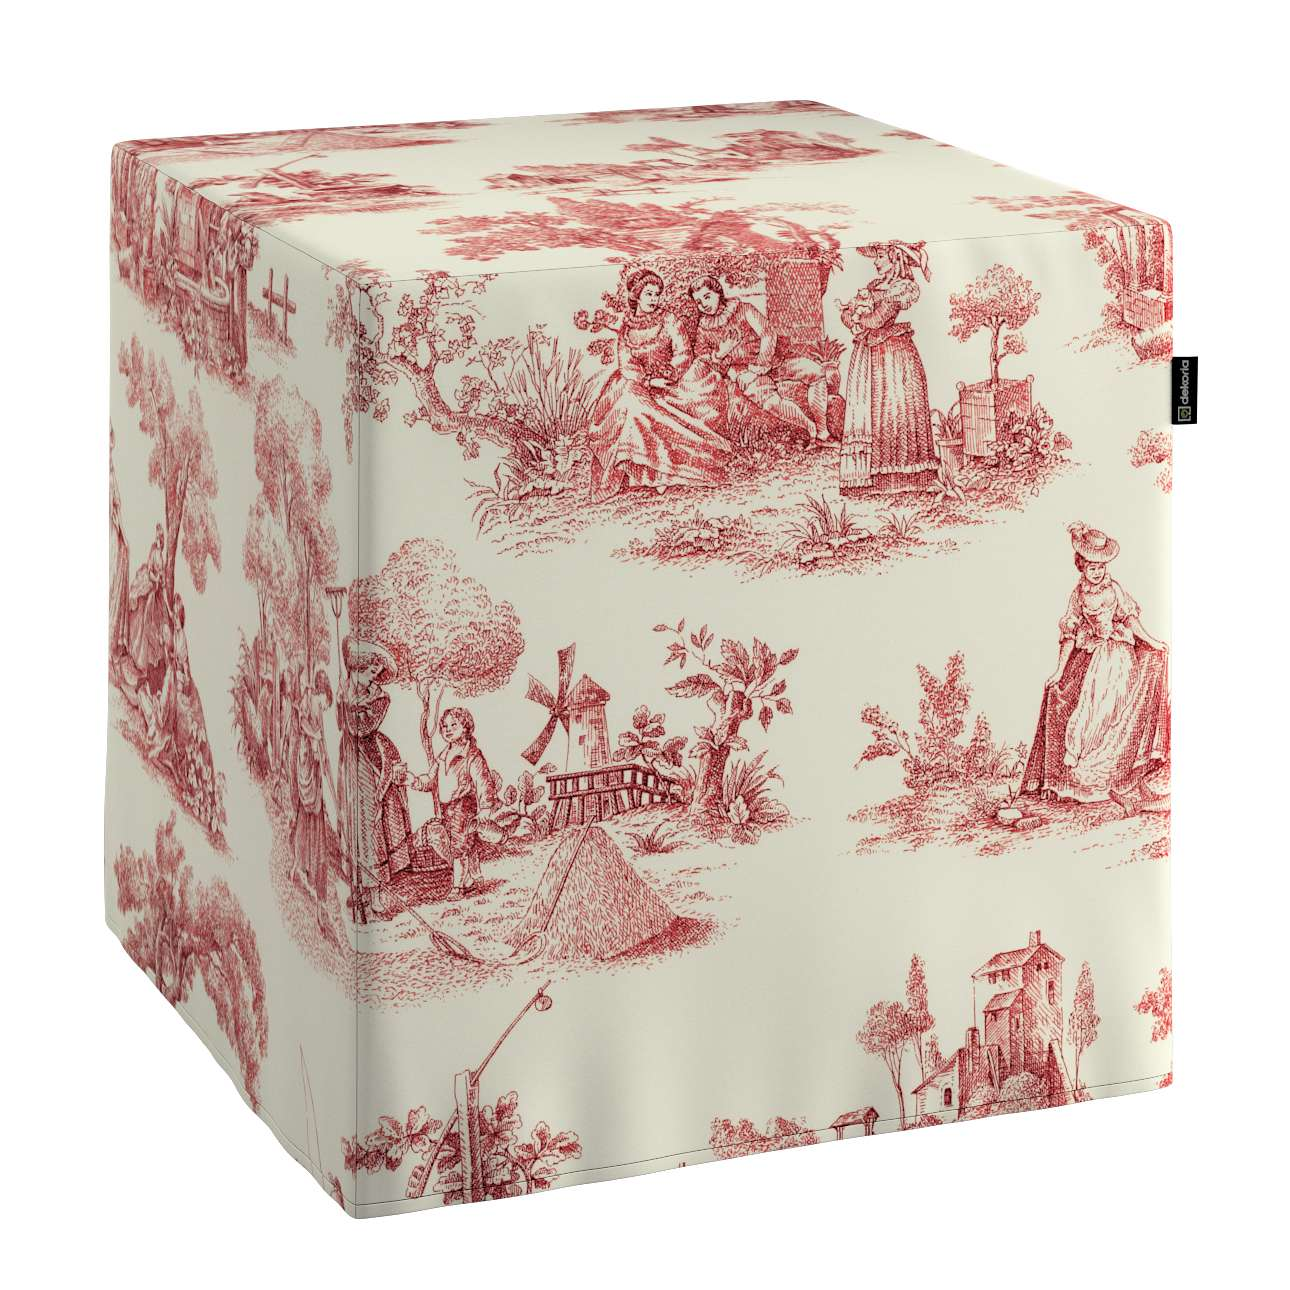 Sedák Cube - kostka pevná 40x40x40 v kolekci Avignon, látka: 132-15